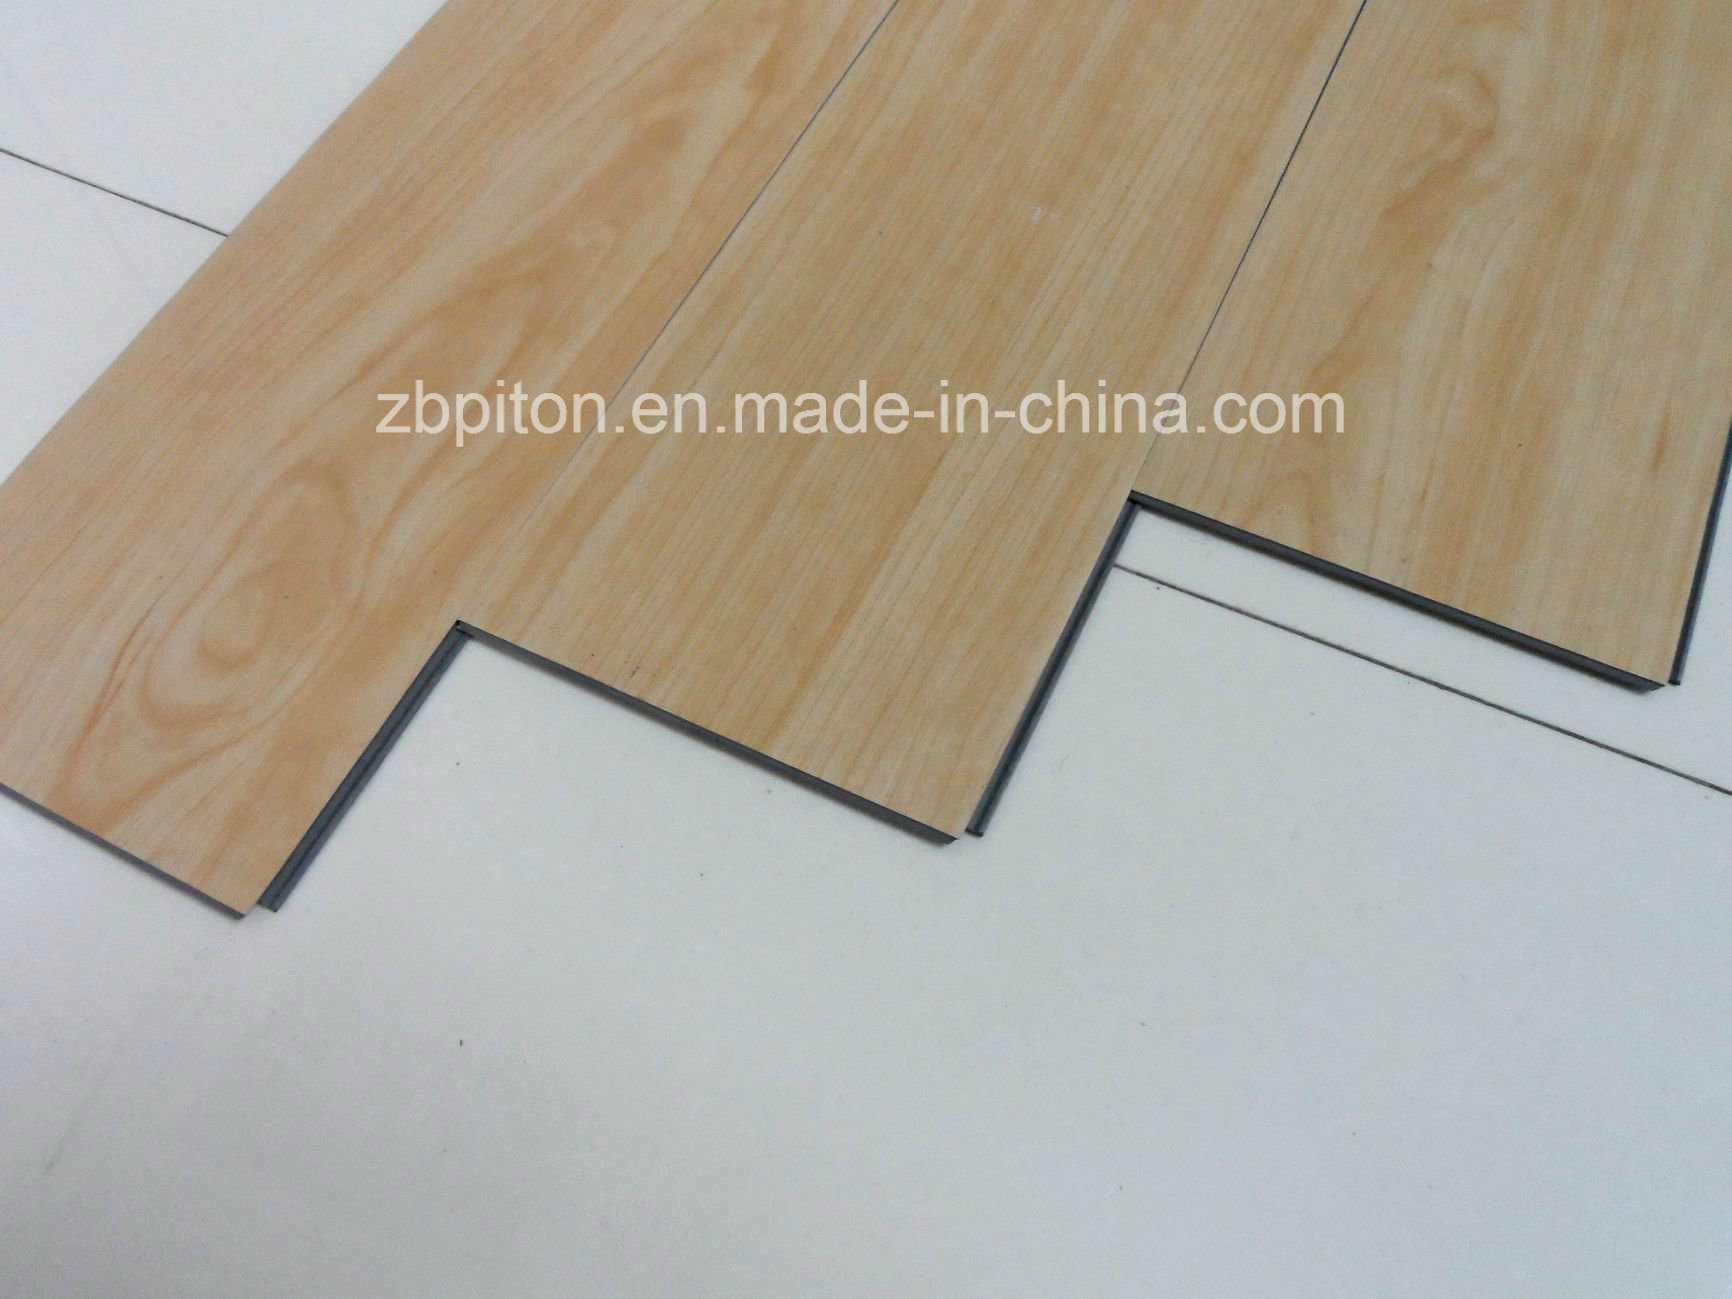 China beautiful pvc vinyl flooring tile with click locking system beautiful pvc vinyl flooring tile with click locking system cng0454n dailygadgetfo Choice Image